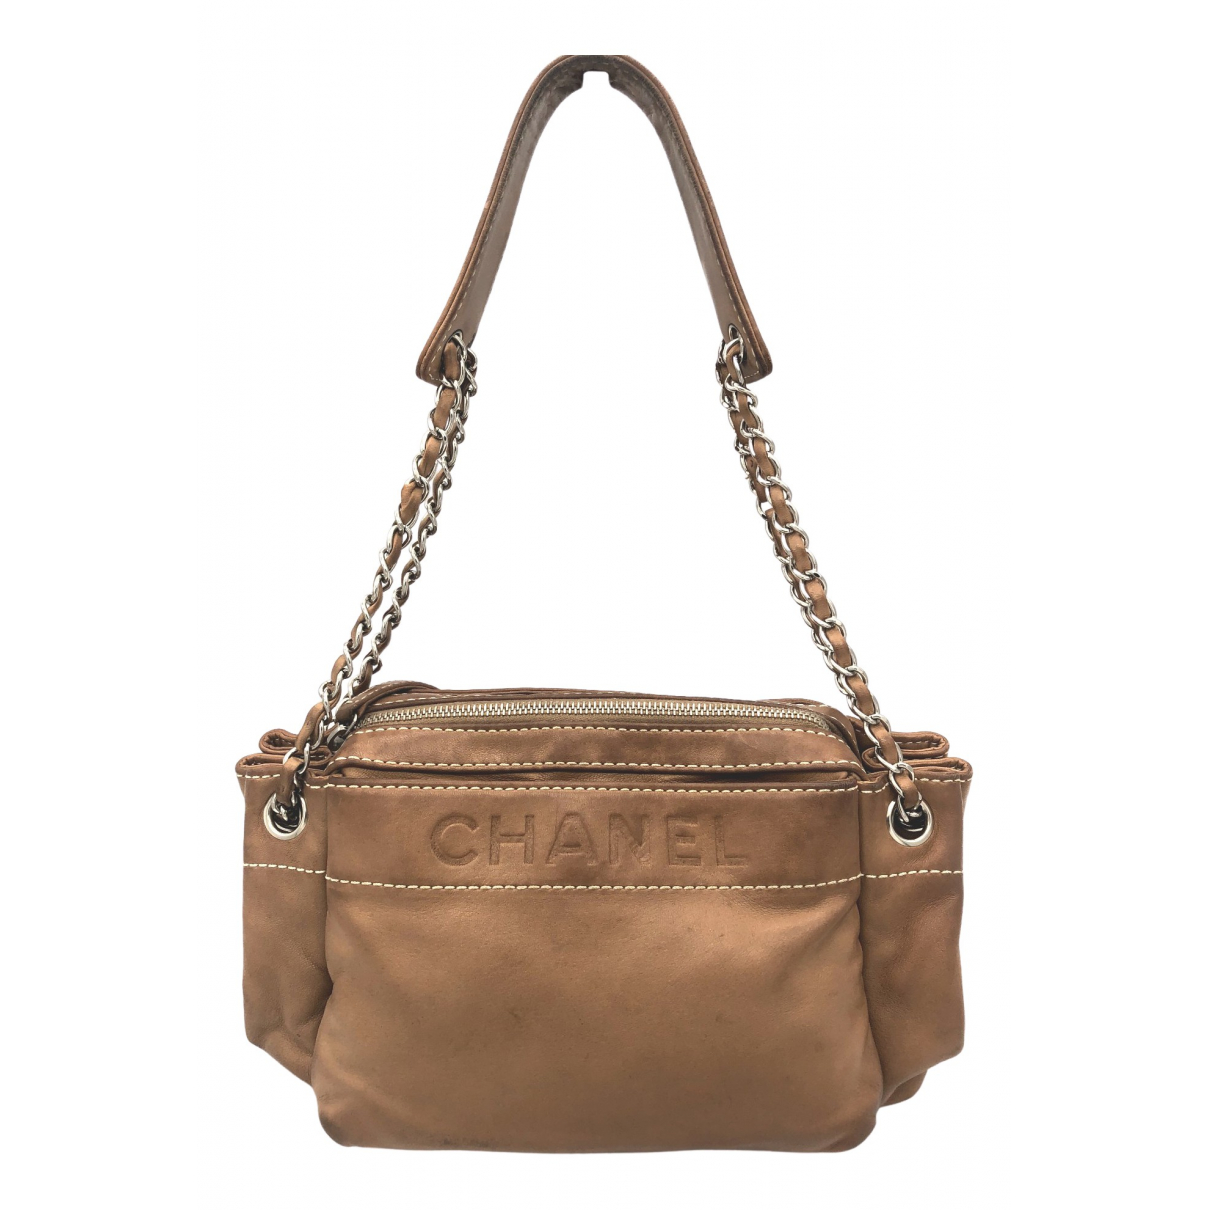 Chanel \N Camel Leather handbag for Women \N